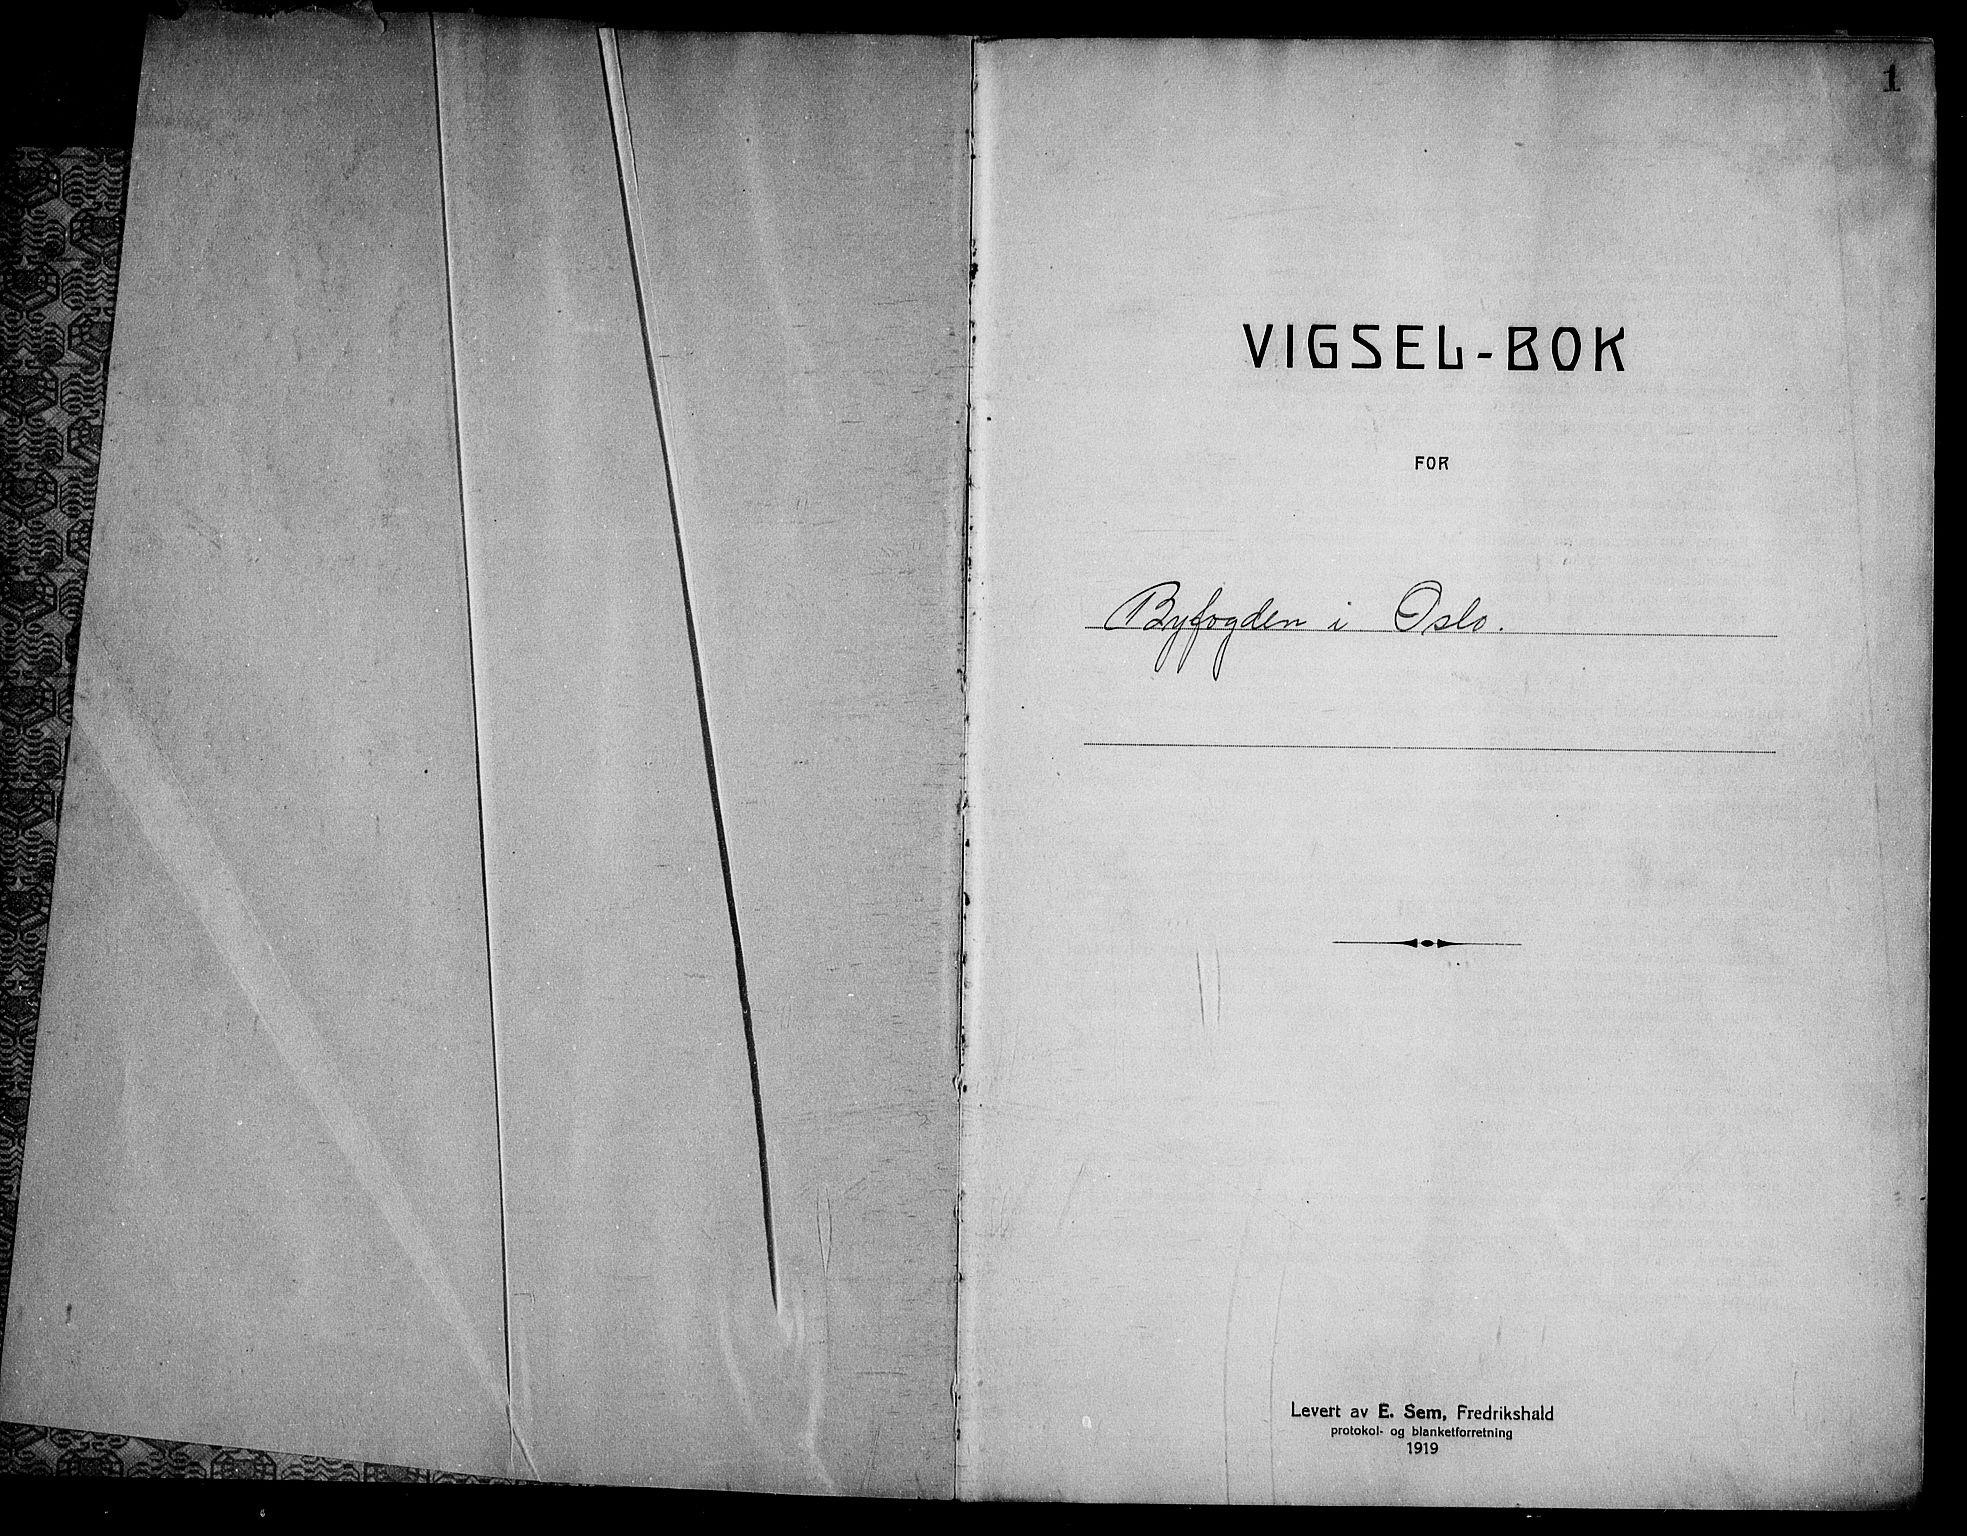 SAO, Oslo byfogd avd. I, L/Lb/Lbb/L0020: Notarialprotokoll, rekke II: Vigsler, 1929-1930, s. 1a